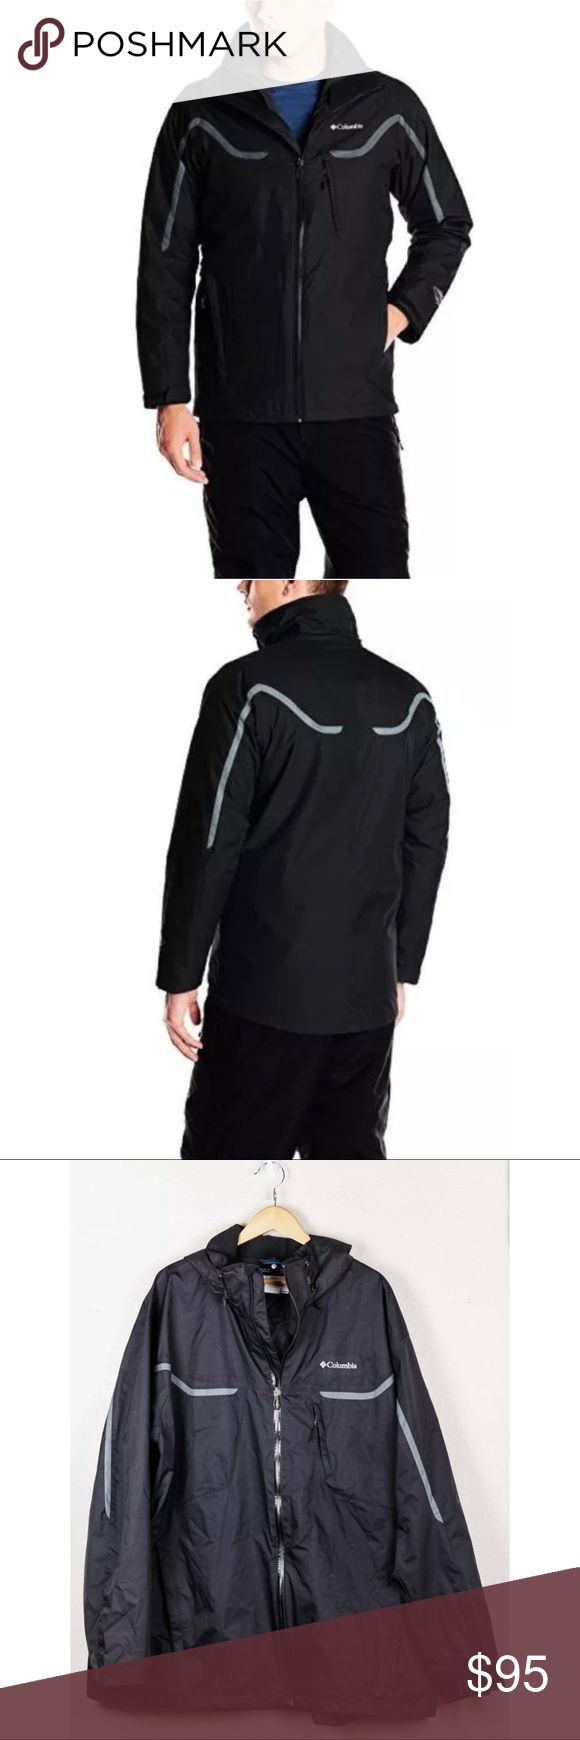 Columbia Black Whirlibird Interchange Ski Jacket Columbia Sportswear Men's Black Whirlibird Interchange Tall Ski Jacket 3XT 3X. Exterior jacket only  Bust: 33 Shoulder: 27 Length: 33.5 Columbia Jackets & Coats Ski & Snowboard